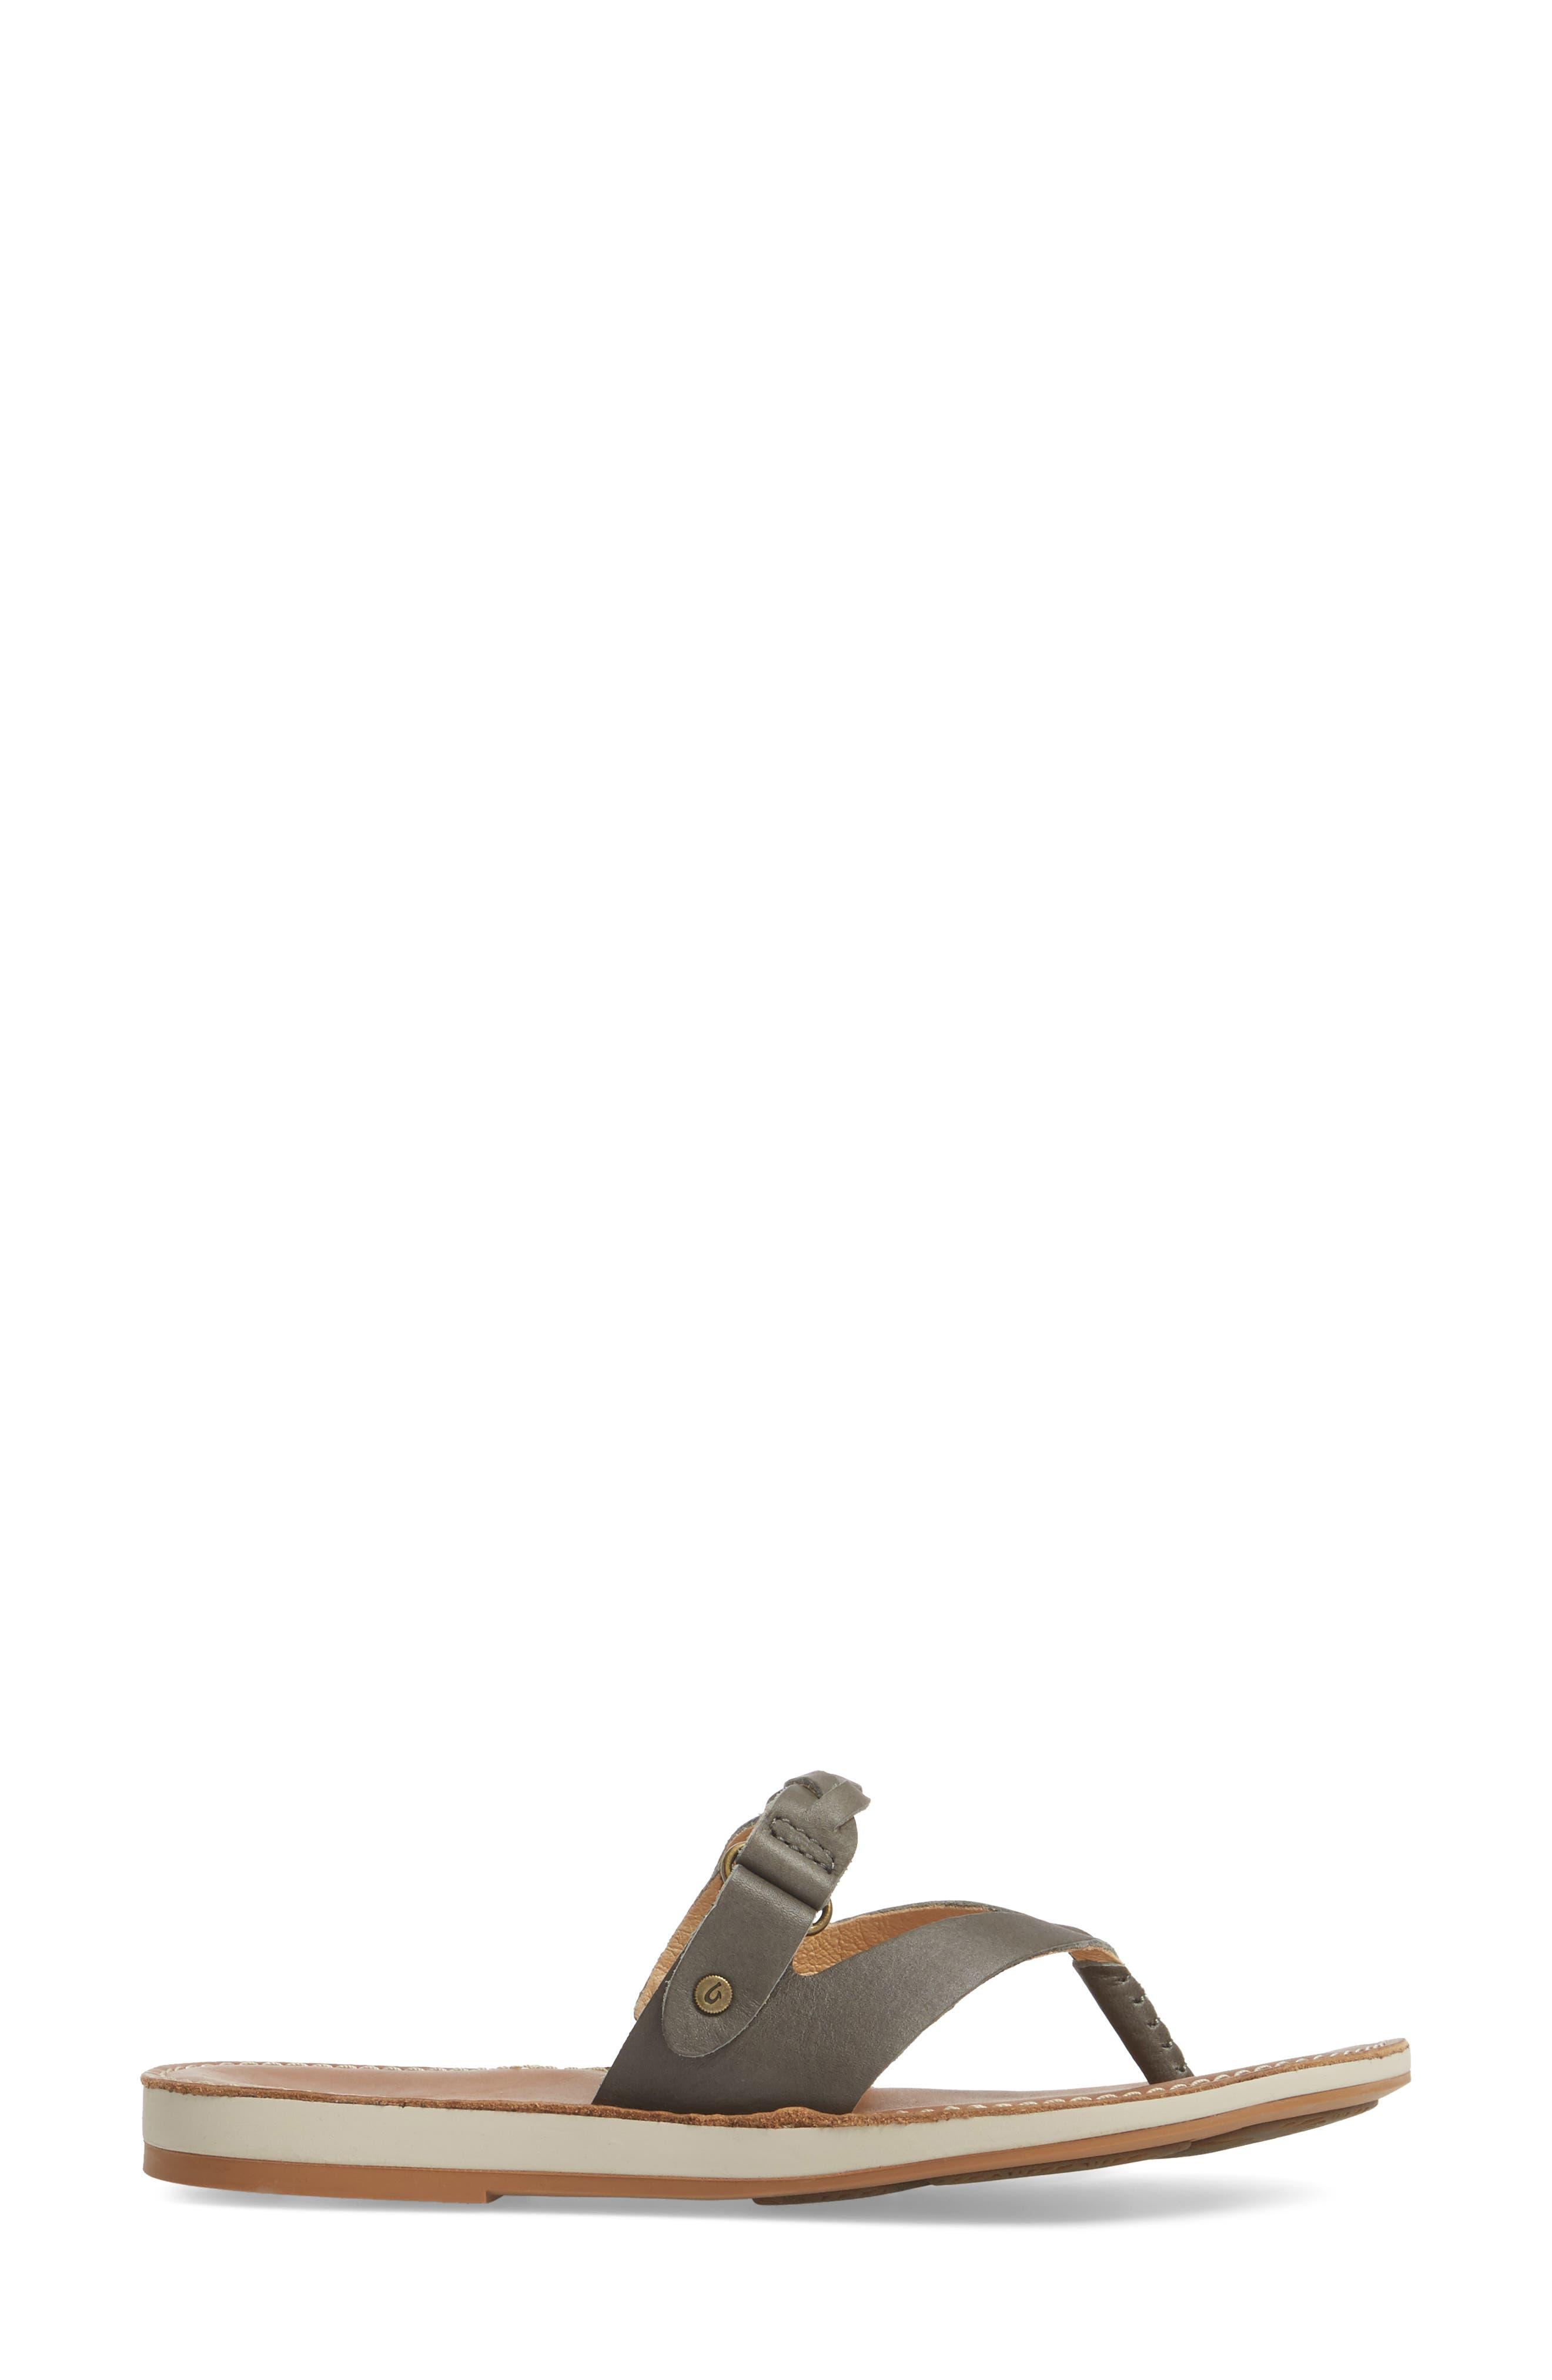 Kahikolu Flip Flop,                             Alternate thumbnail 3, color,                             SLATE/ TAN LEATHER